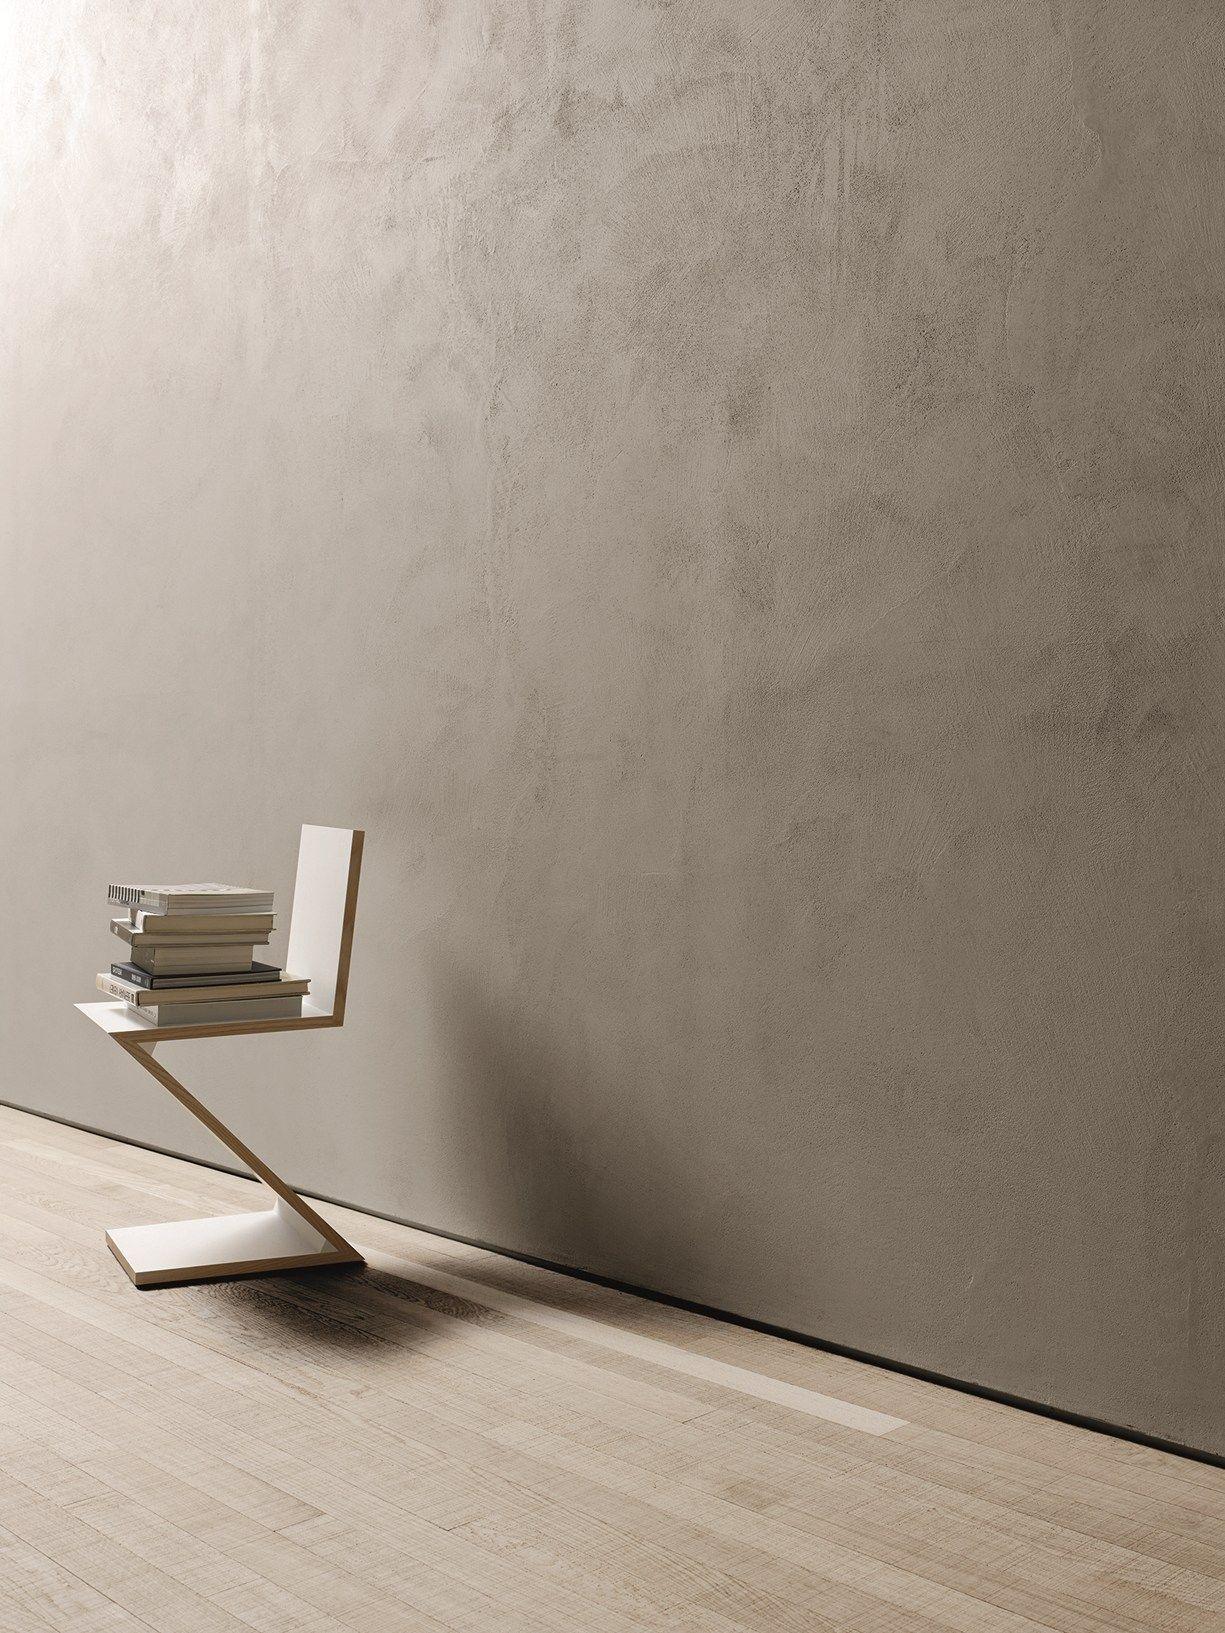 Un loft total white dal mood industriale - Pitture decorative moderne ...